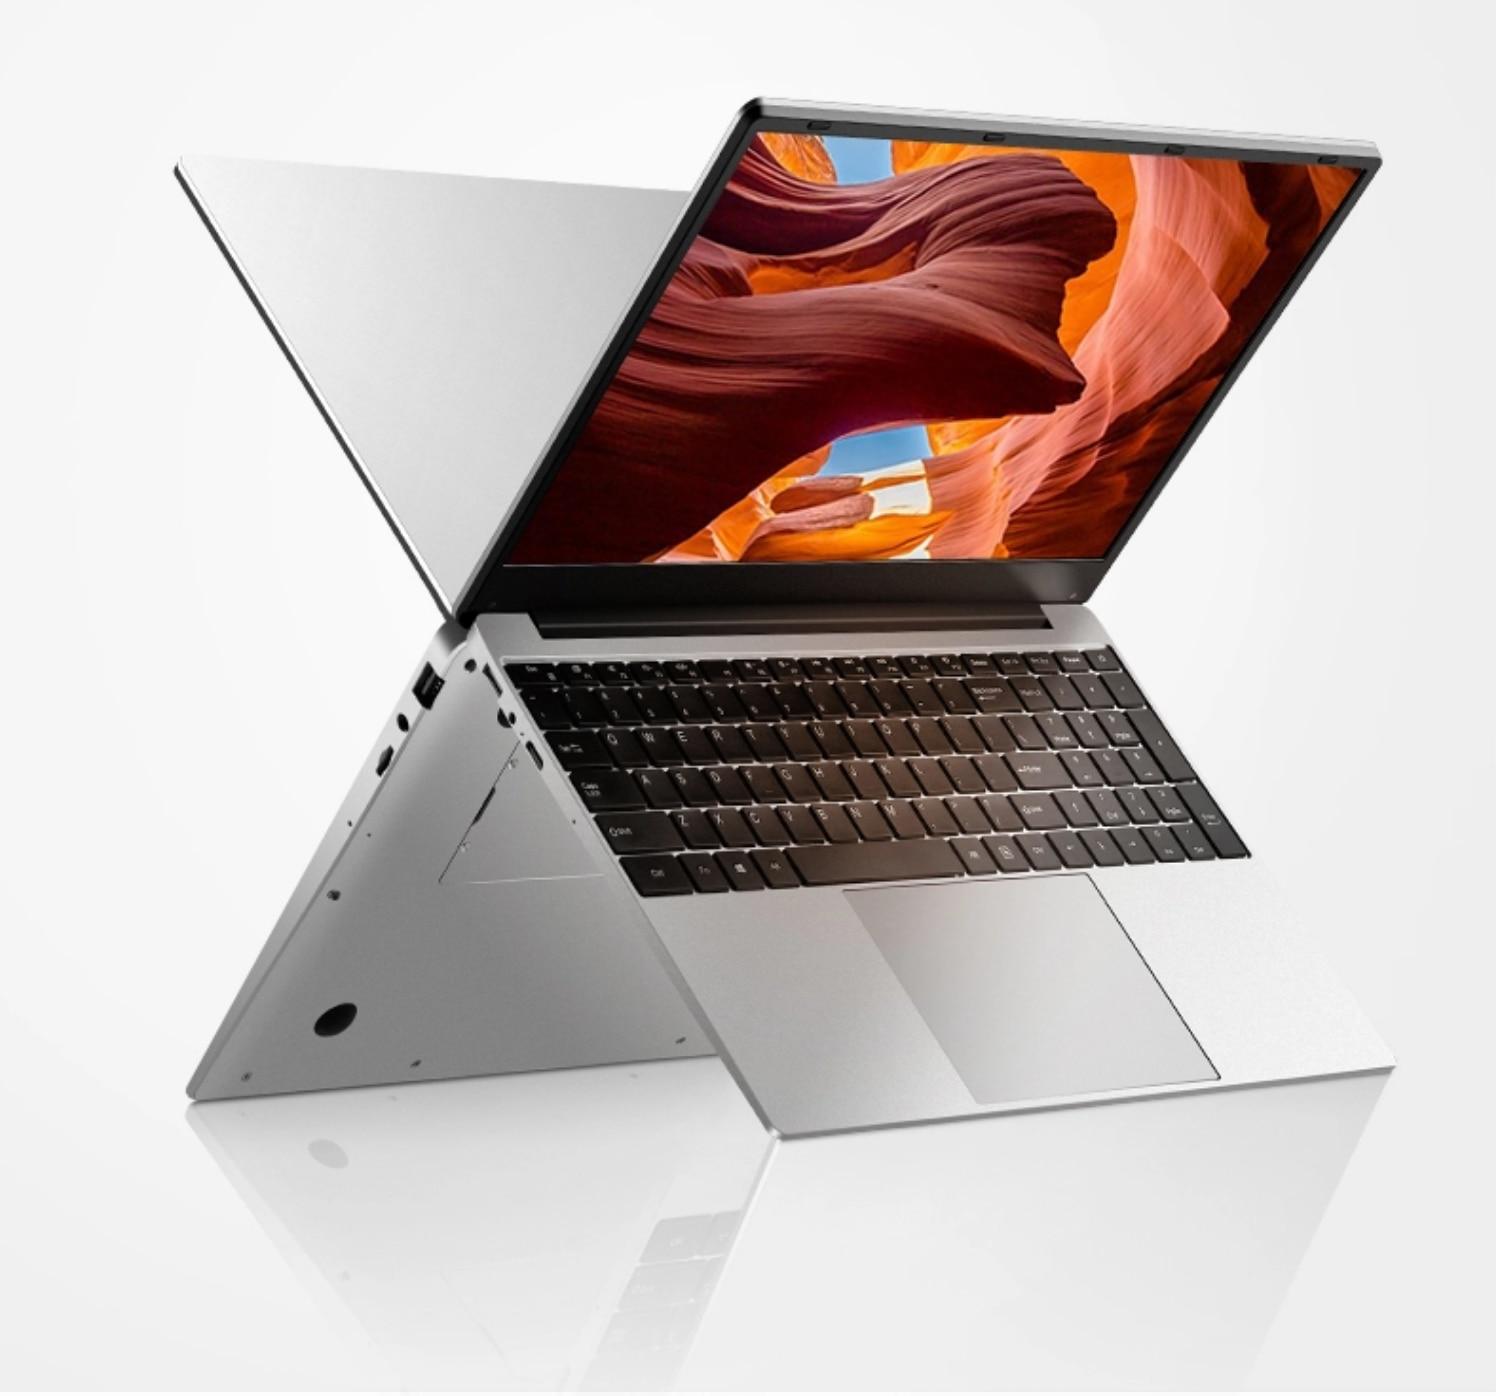 13.3 Inch Ultra Thin Laptop 1080P Intel Core I5 6200U 8G DDR4 2133MHz 256G SATA SSD